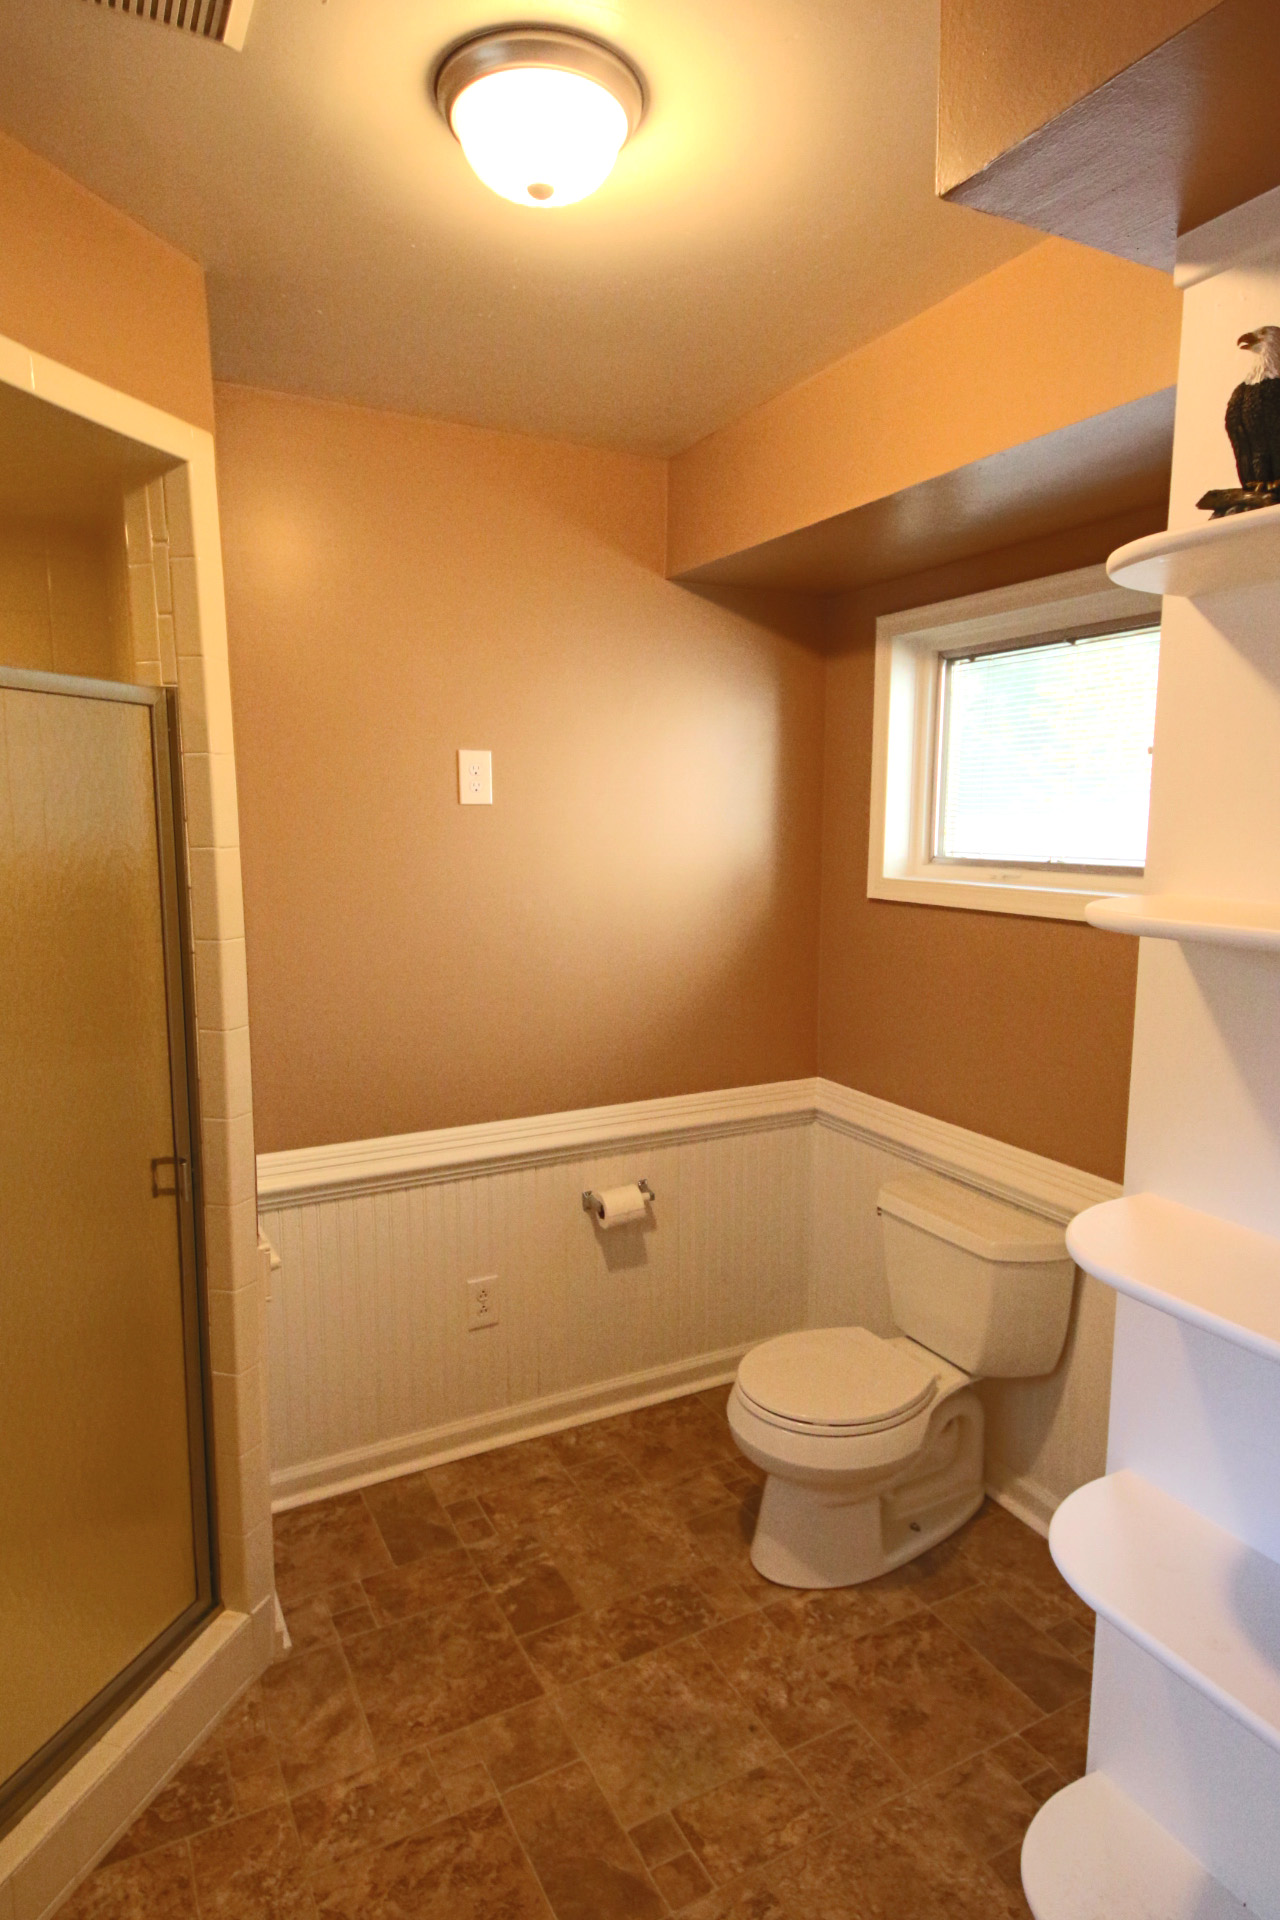 16. Downstairs Bathroom